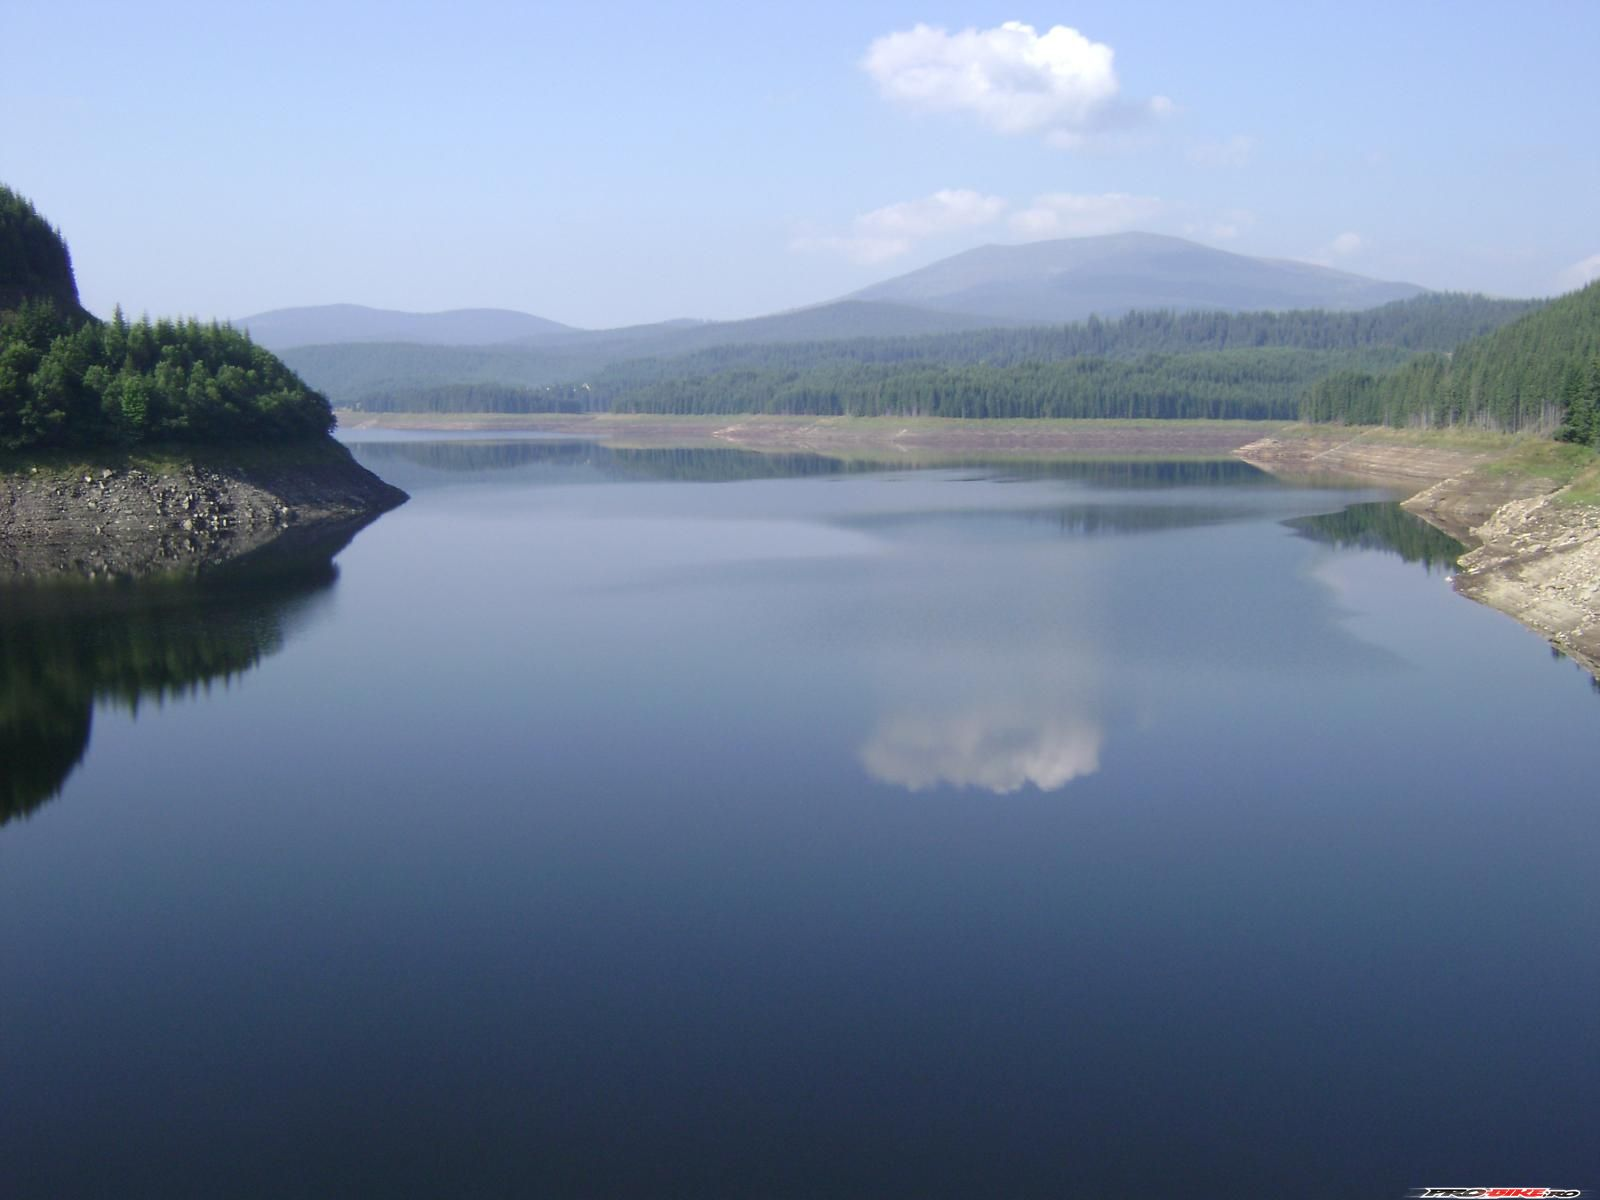 Barajul Oasa